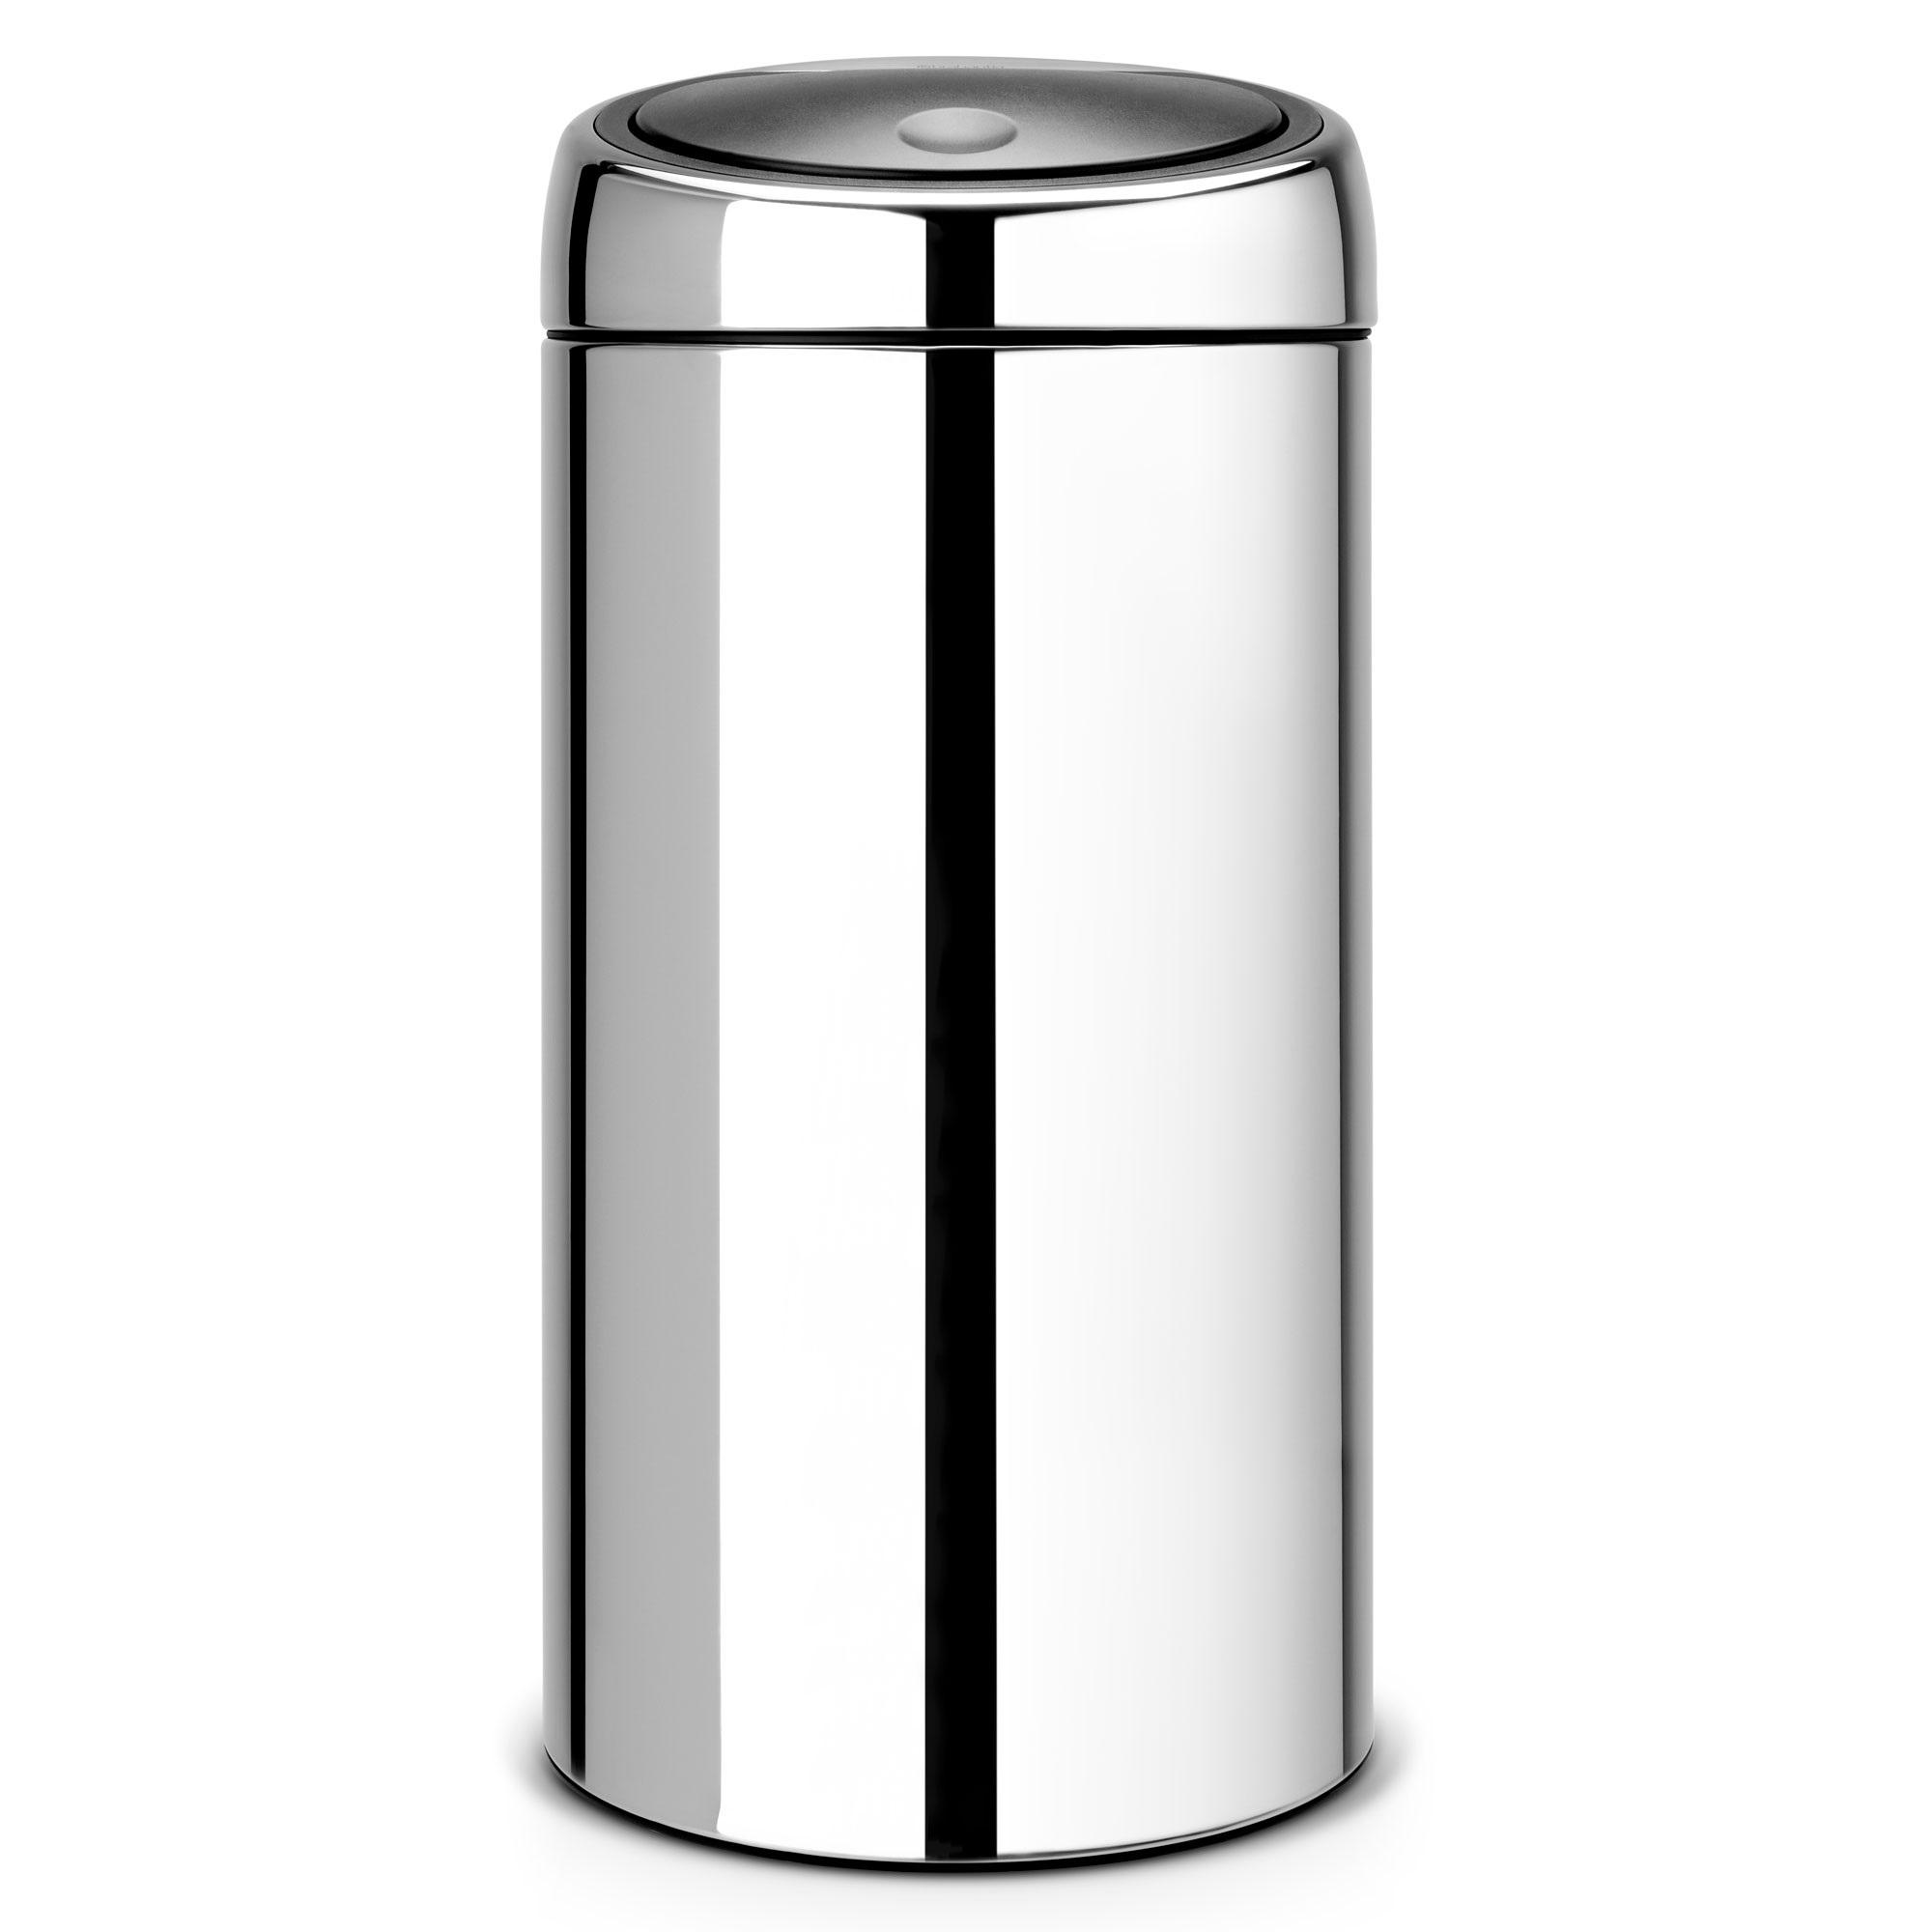 Prullenbak Brabantia Touch Bin 45 Liter.Brabantia Touch Bin Afvalemmer 45 L Jouwveilingen Nl Webshop